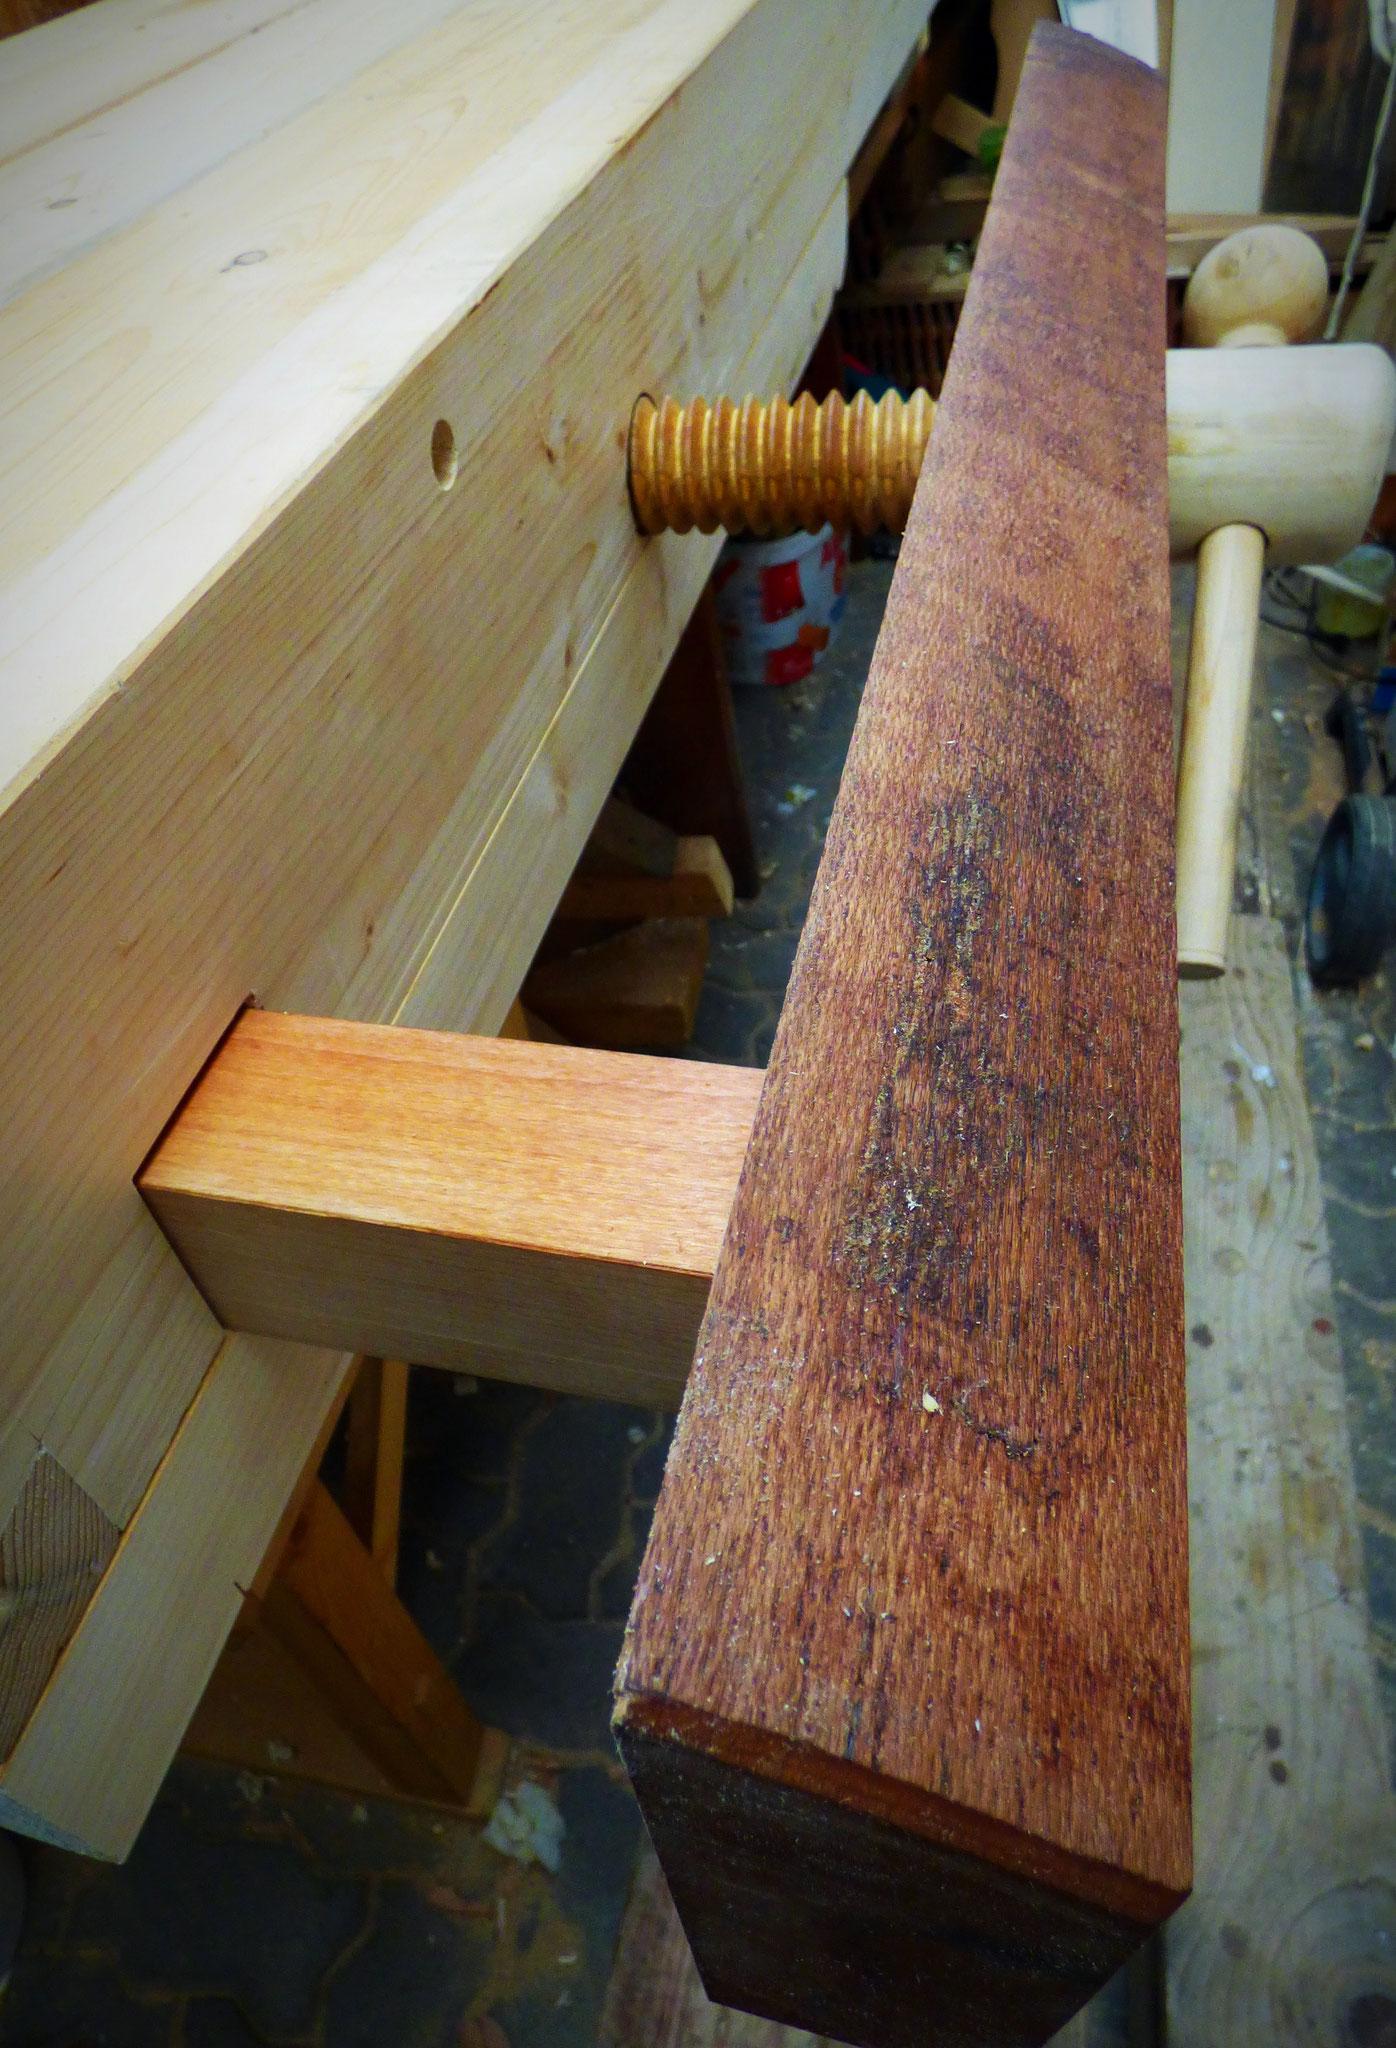 wood working bench vise, face vice, Vorderzange, broche filetée en bois pour étau de charpentier, husillo roscado de madera para vicio de carpintero